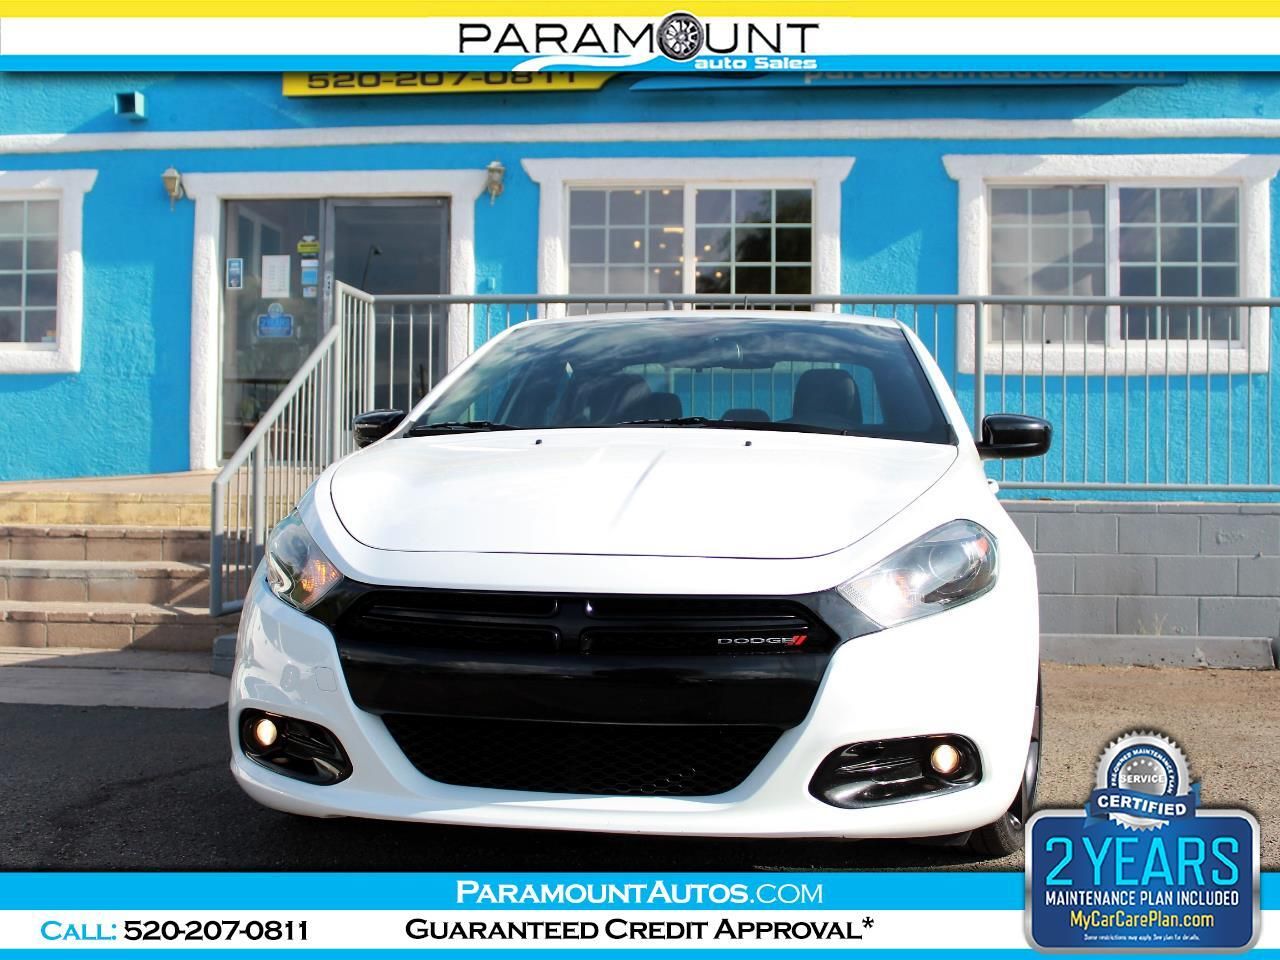 Paramount Auto Sales >> Paramount Auto Sales Tucson Az New Used Cars Trucks Sales Service